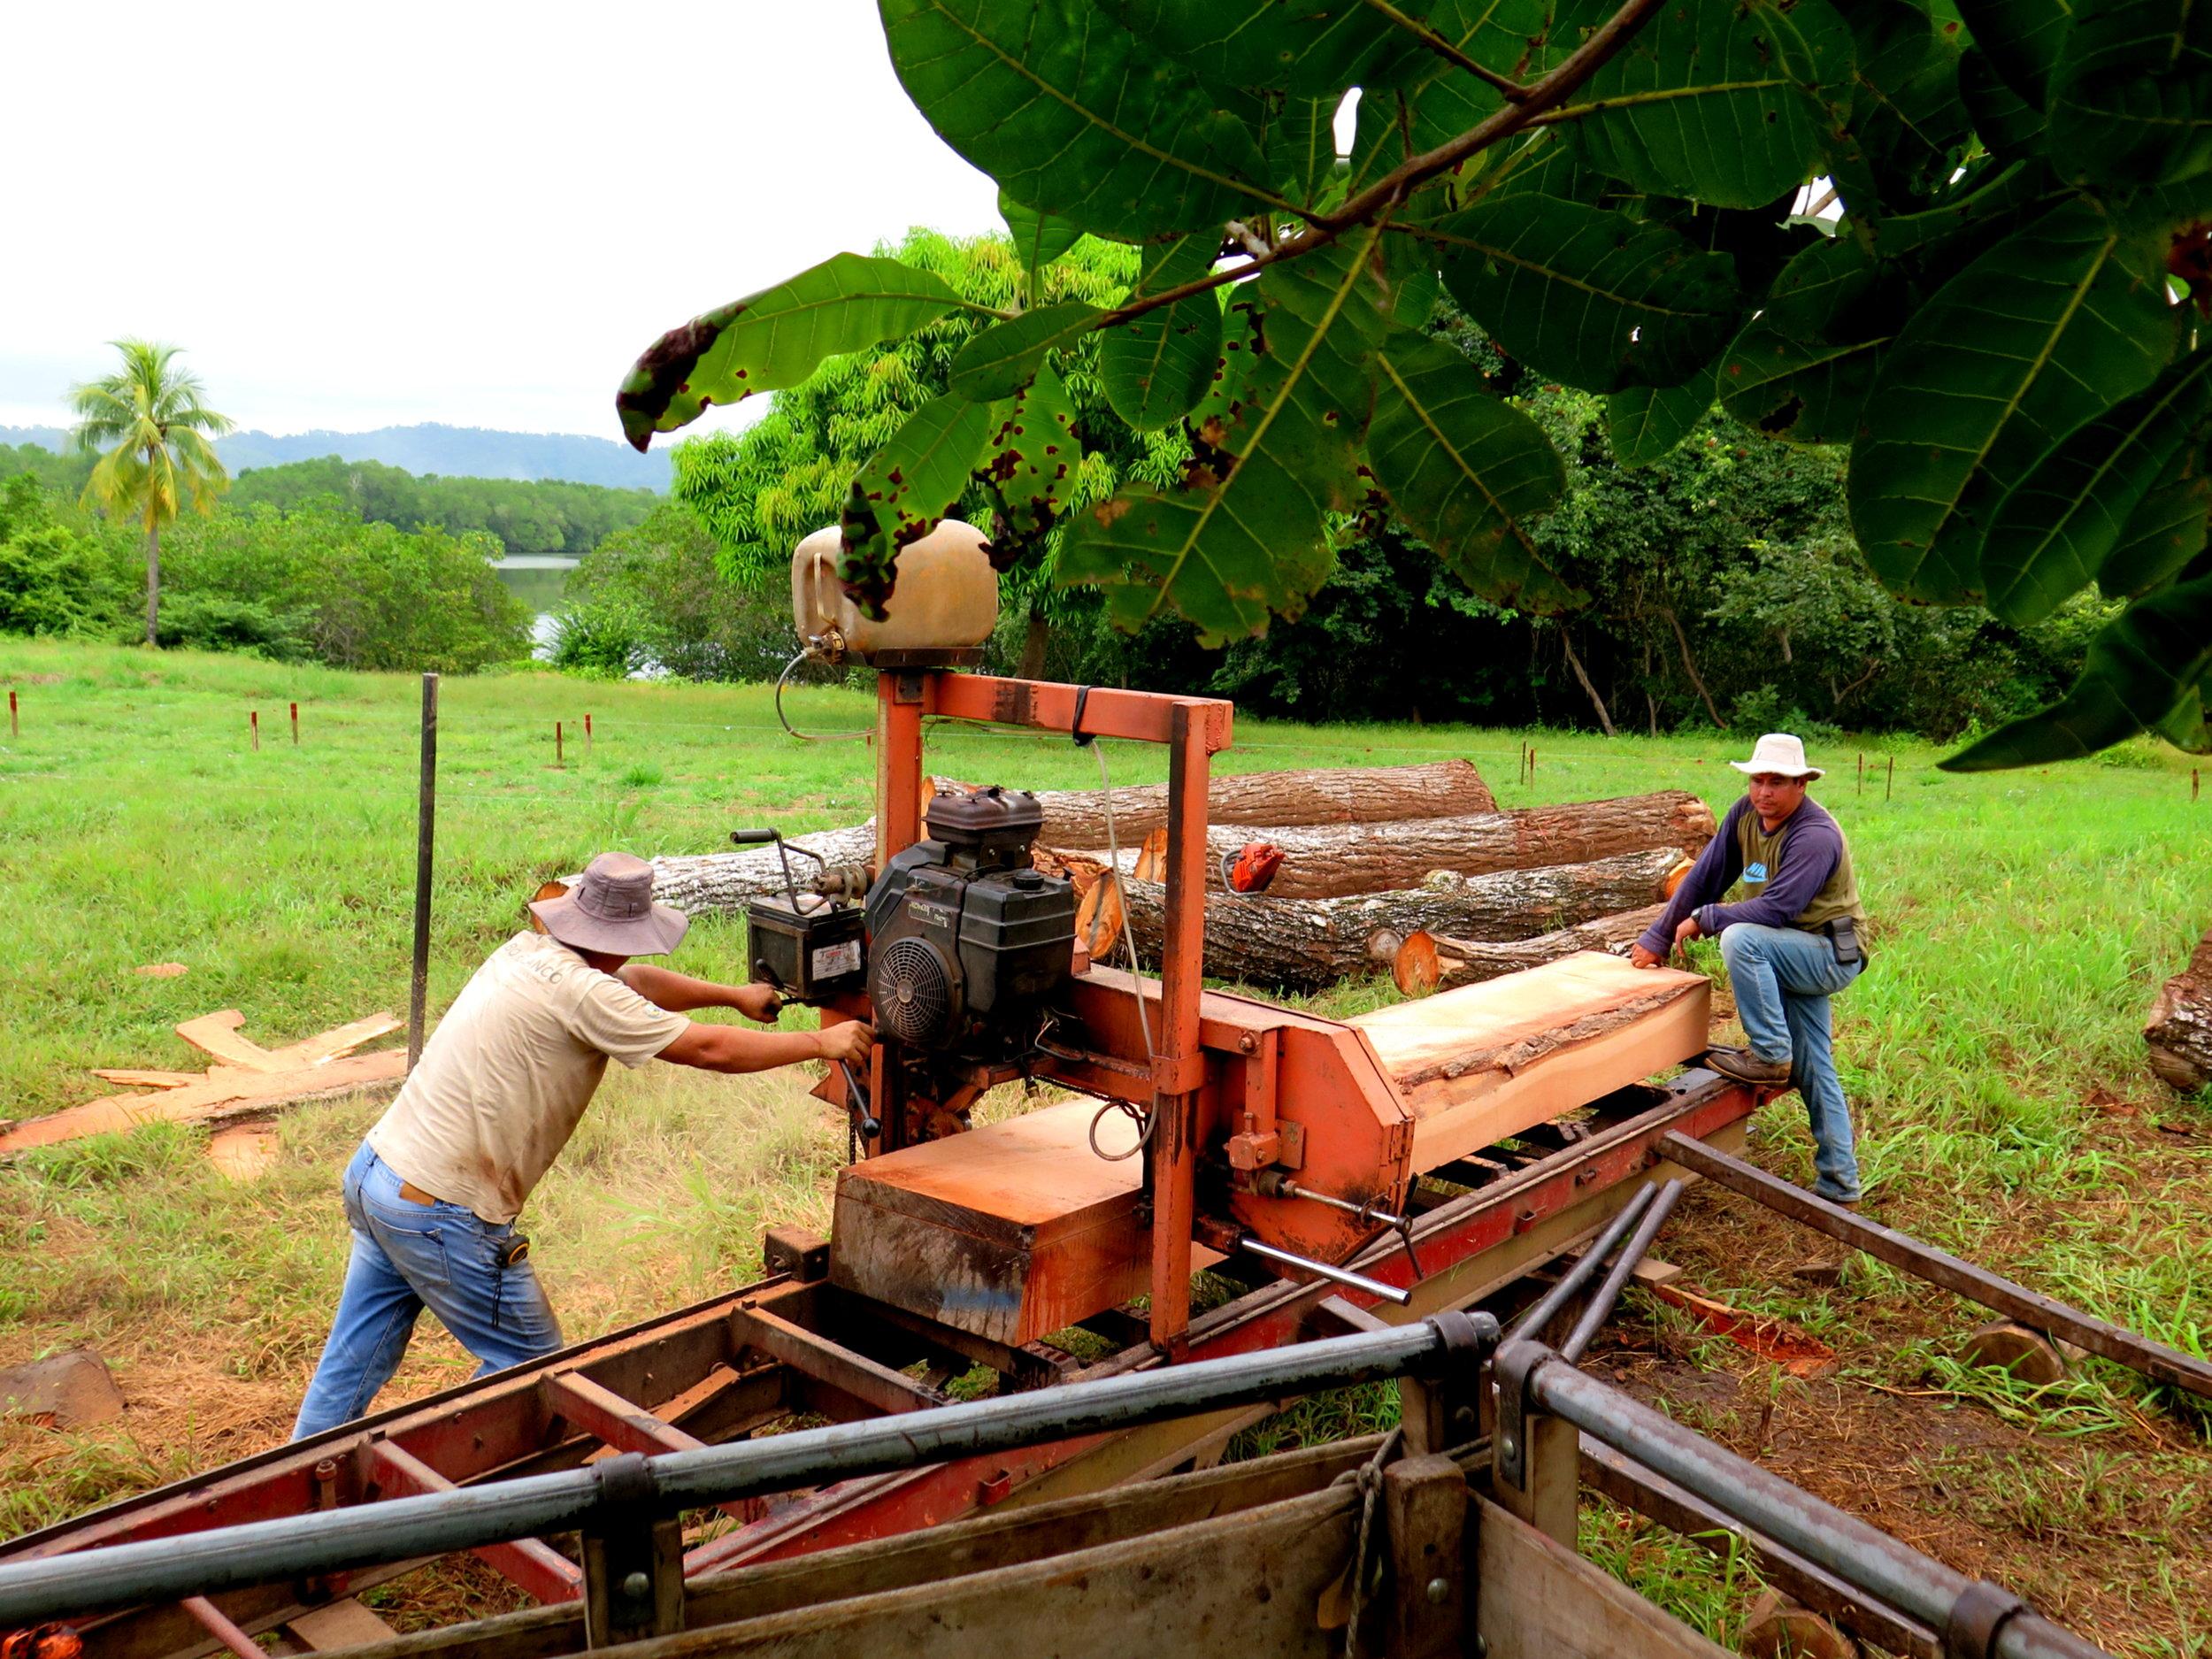 Location: Cocoroca, Punta Morales. Shipyard.  Milling the 'Cedro Amargo' (Spanish Cedar) with the Costa Rican sawyers / lumberjacks.